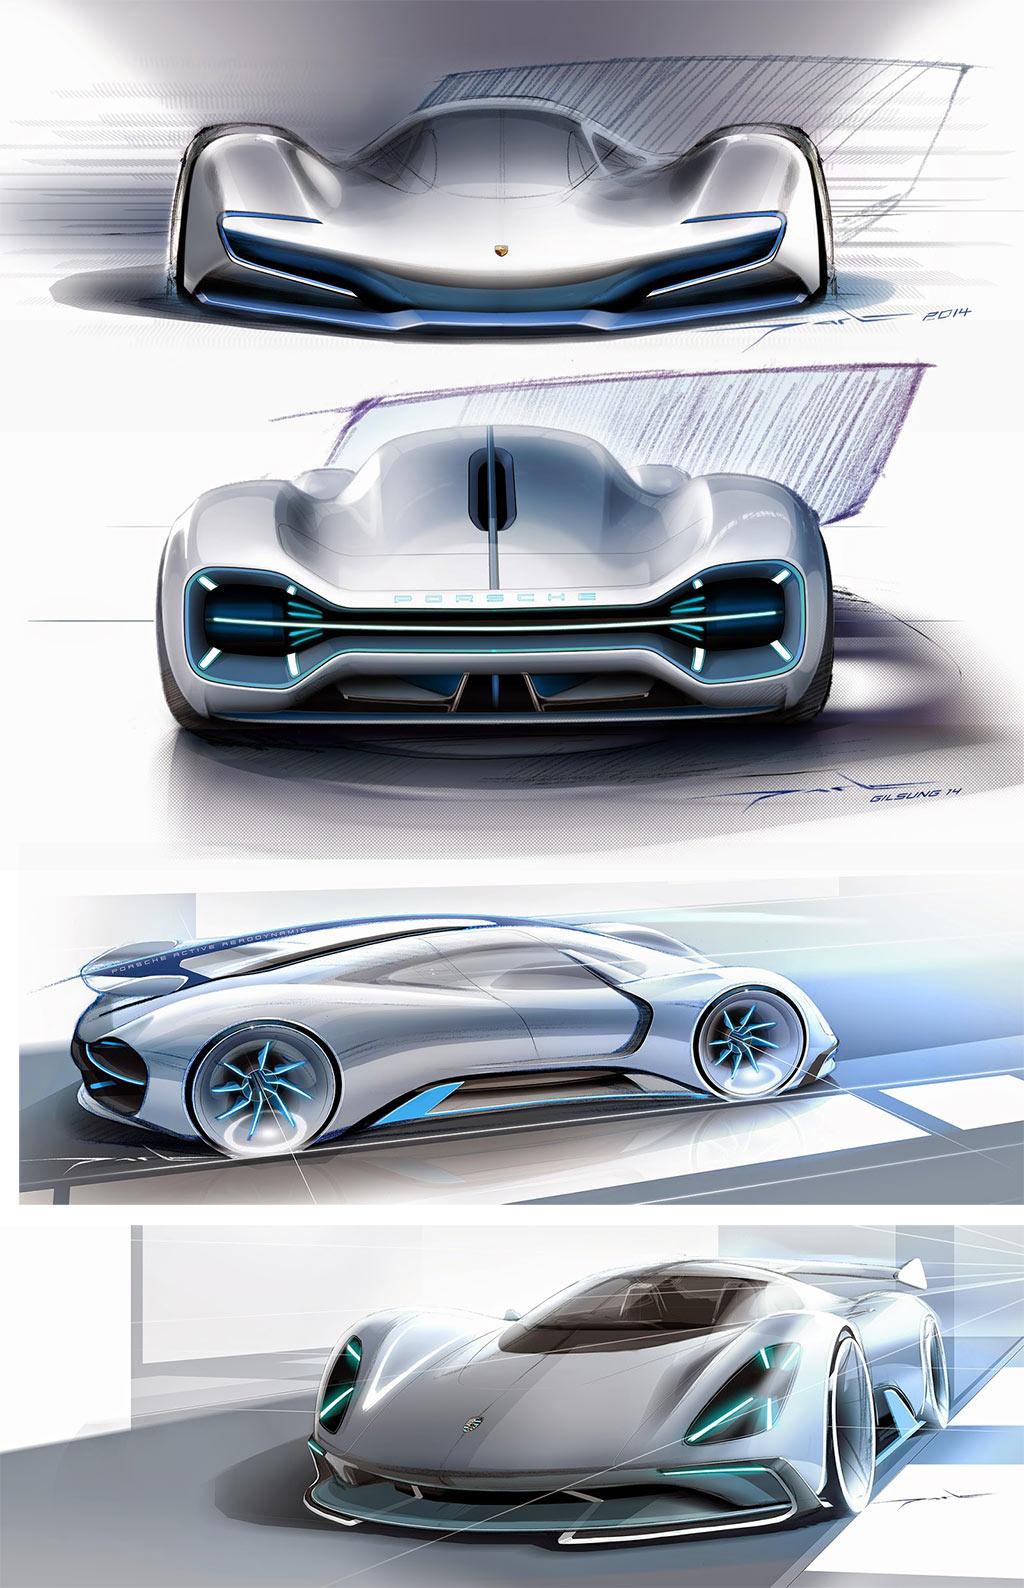 porsche electric le mans 2035 concept design sketches by. Black Bedroom Furniture Sets. Home Design Ideas